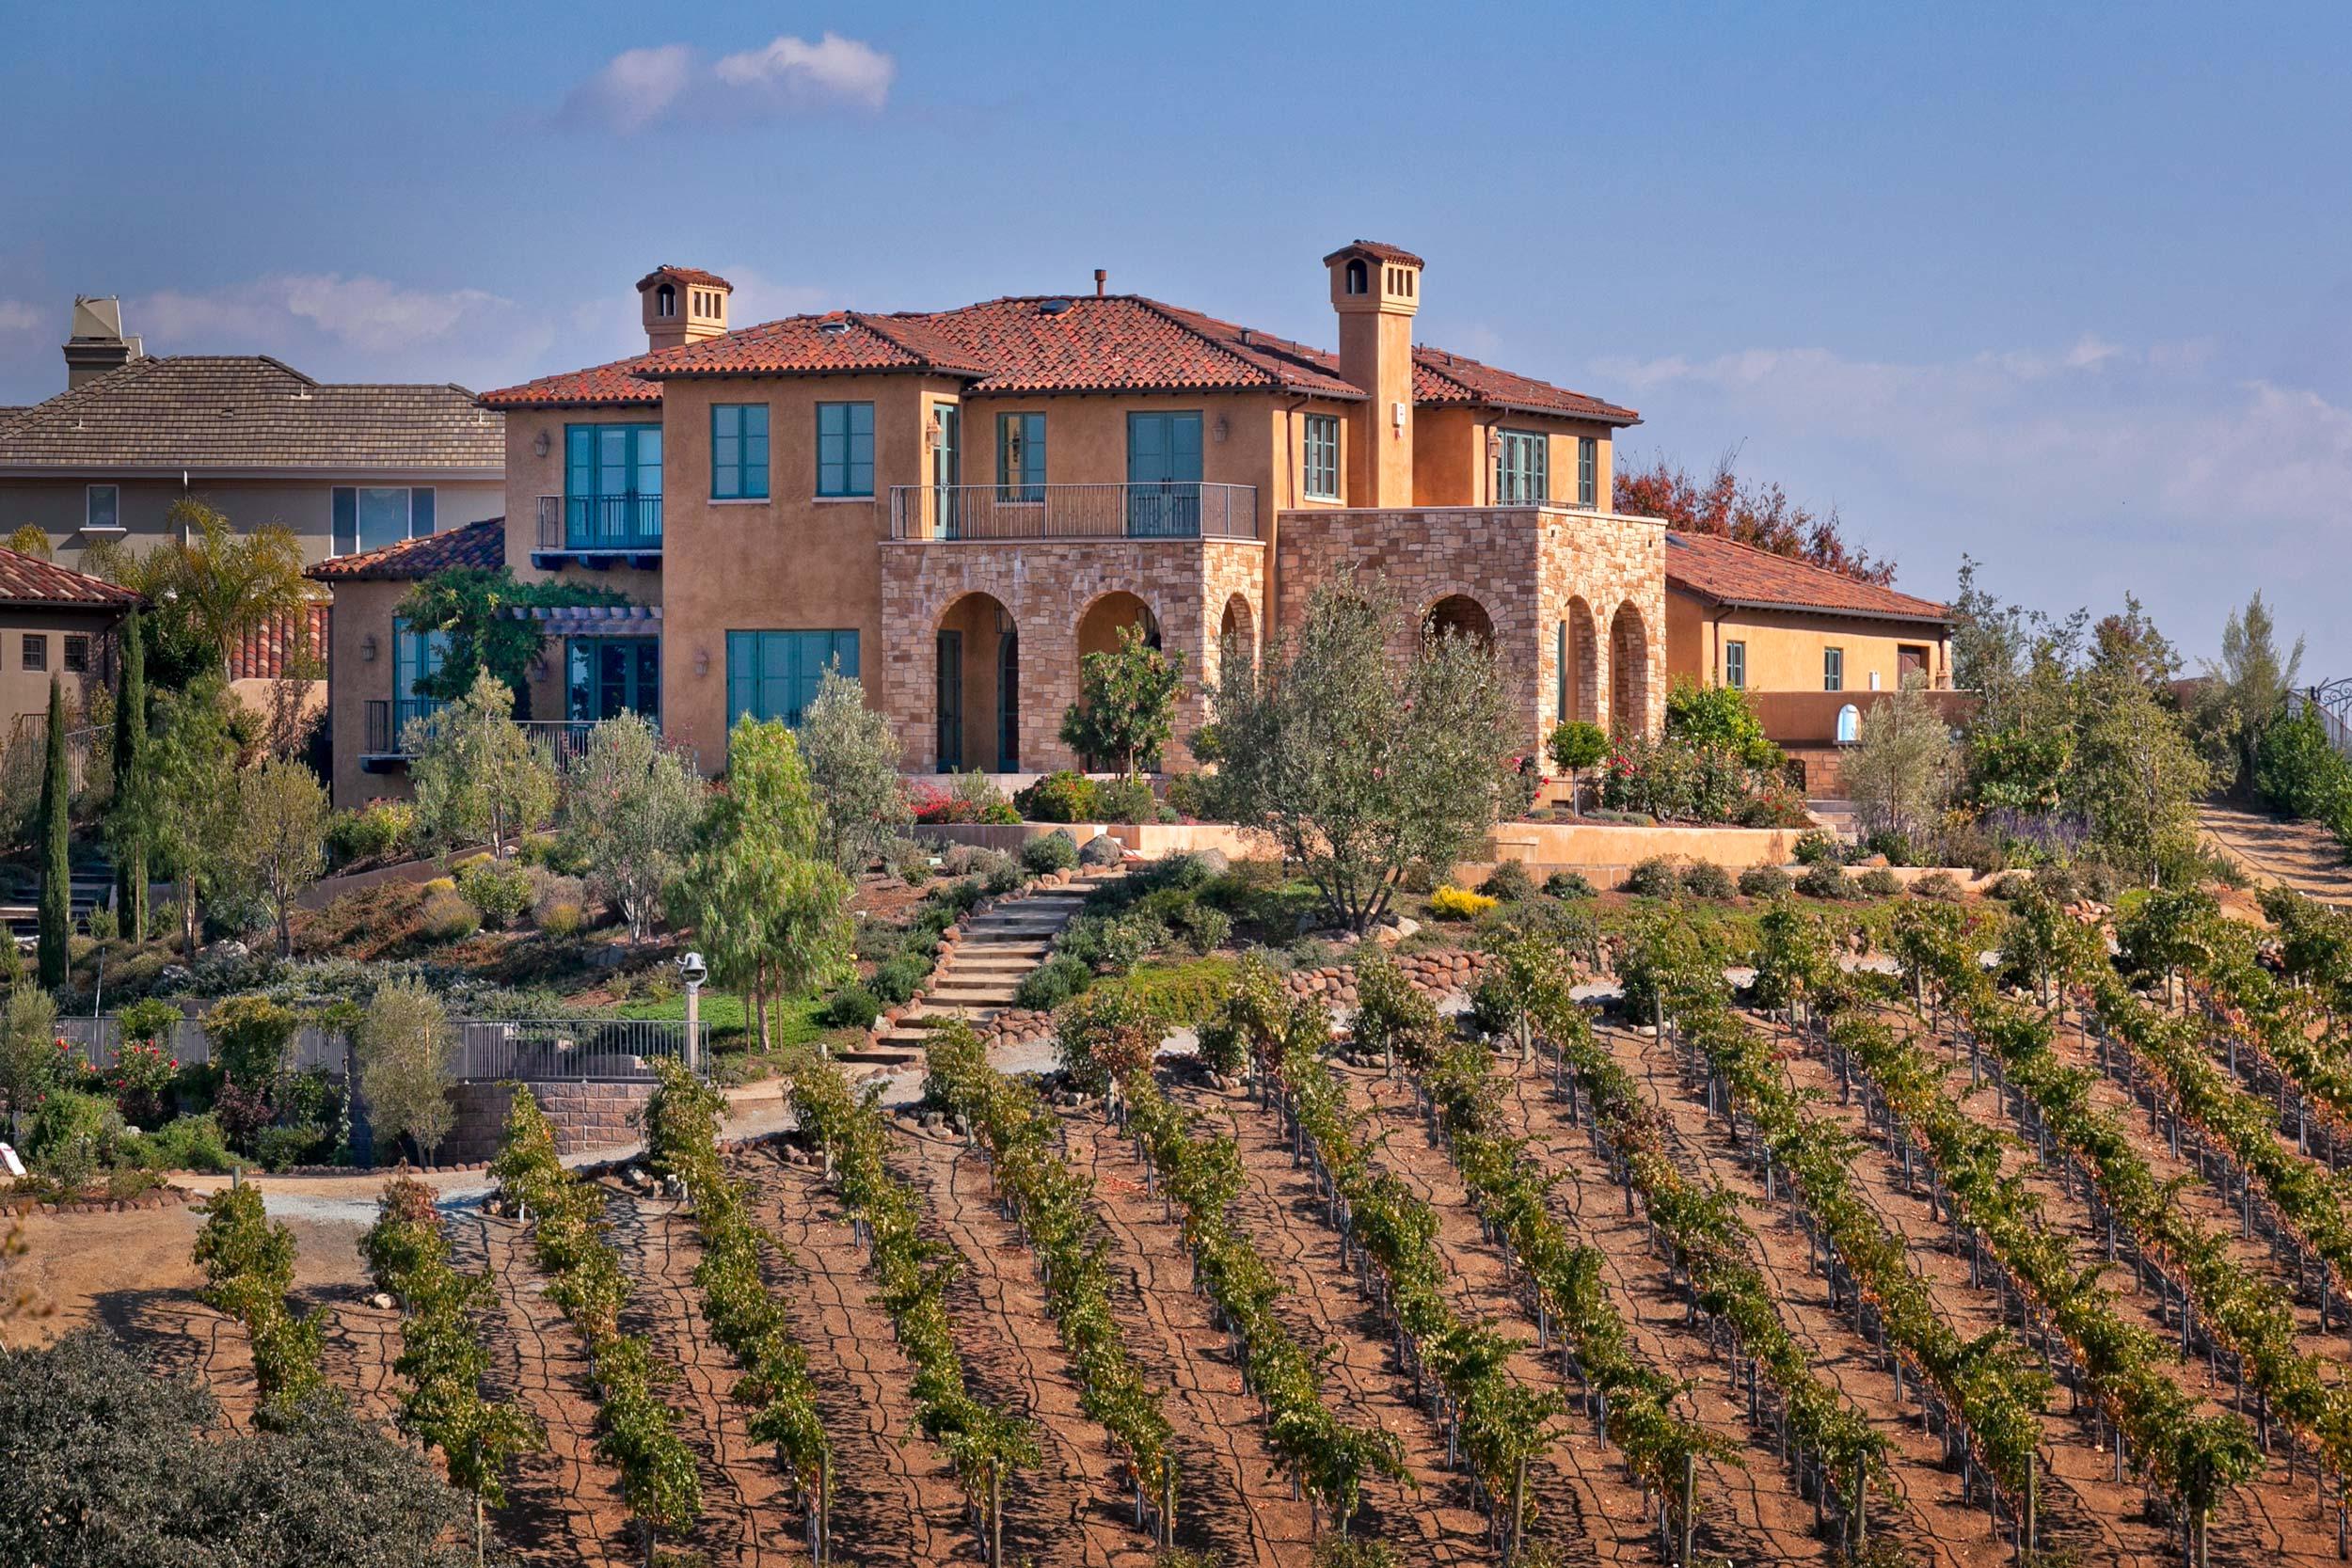 Tuscan Vineyard in Almaden Valley, 95120